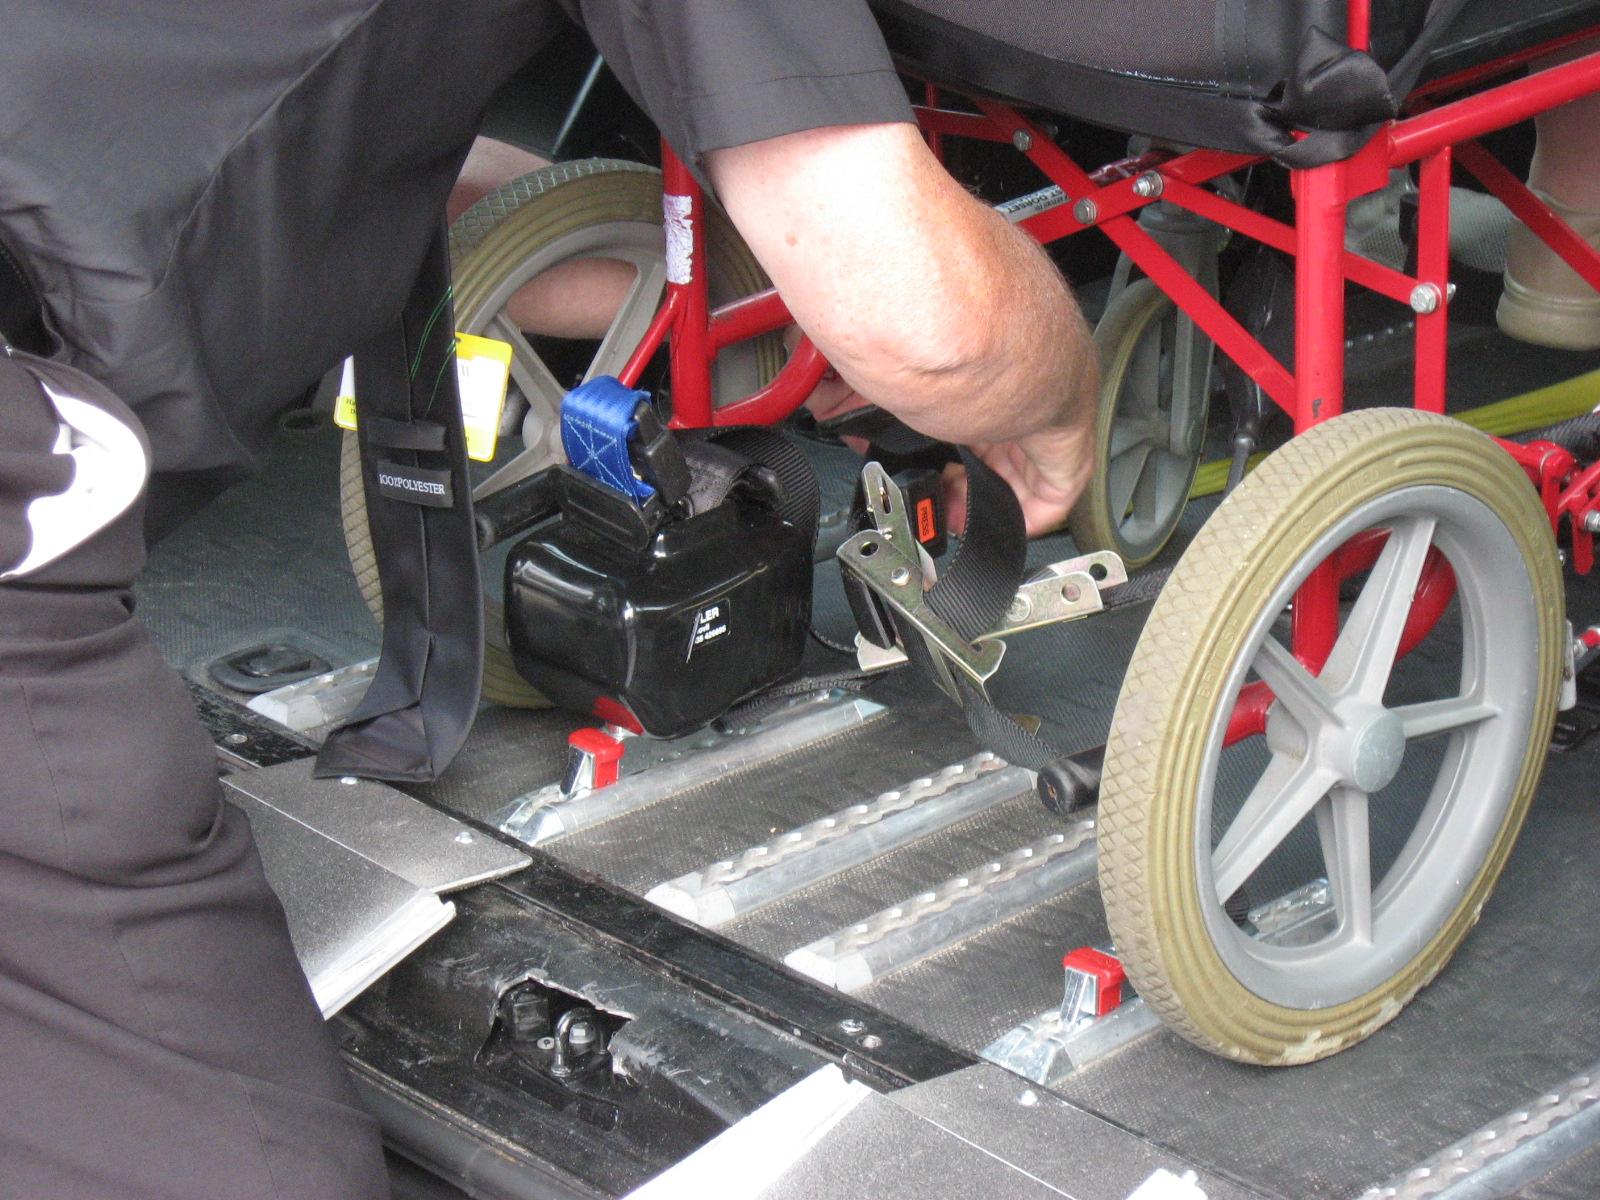 cig bins and wheelchair pics 030